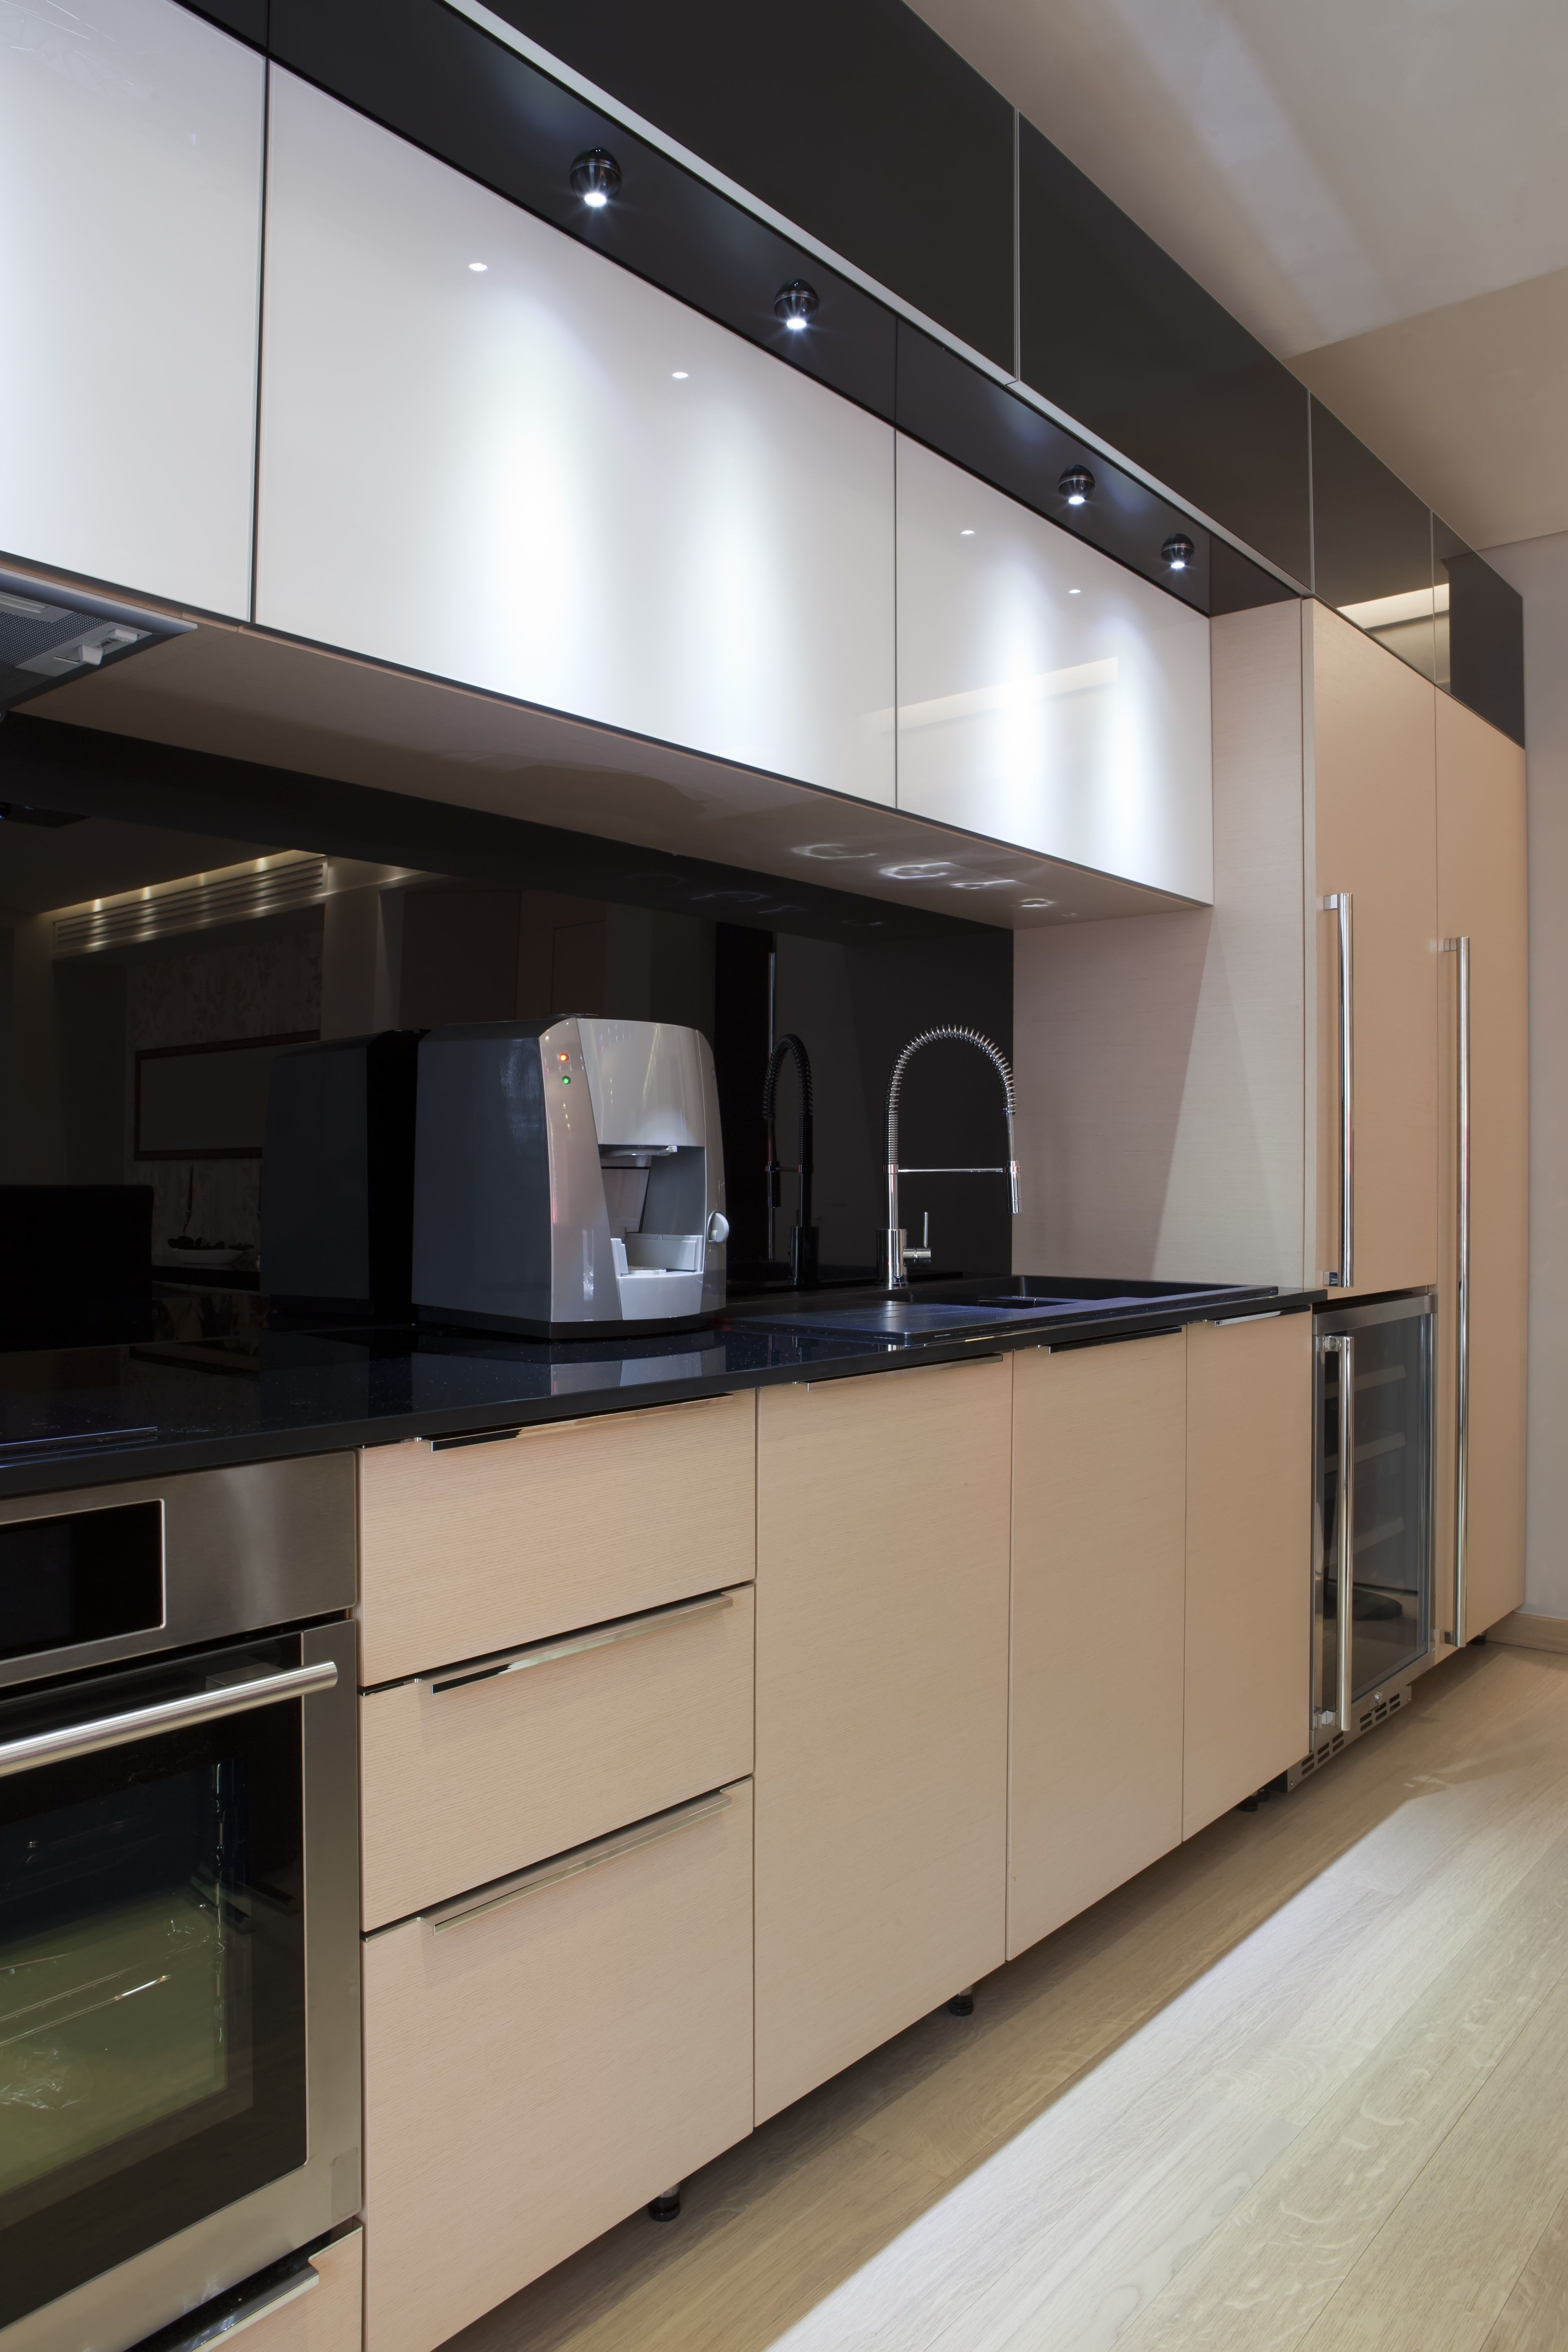 Luces muebles altos cocina pinterest ideas para - Luces para muebles de cocina ...